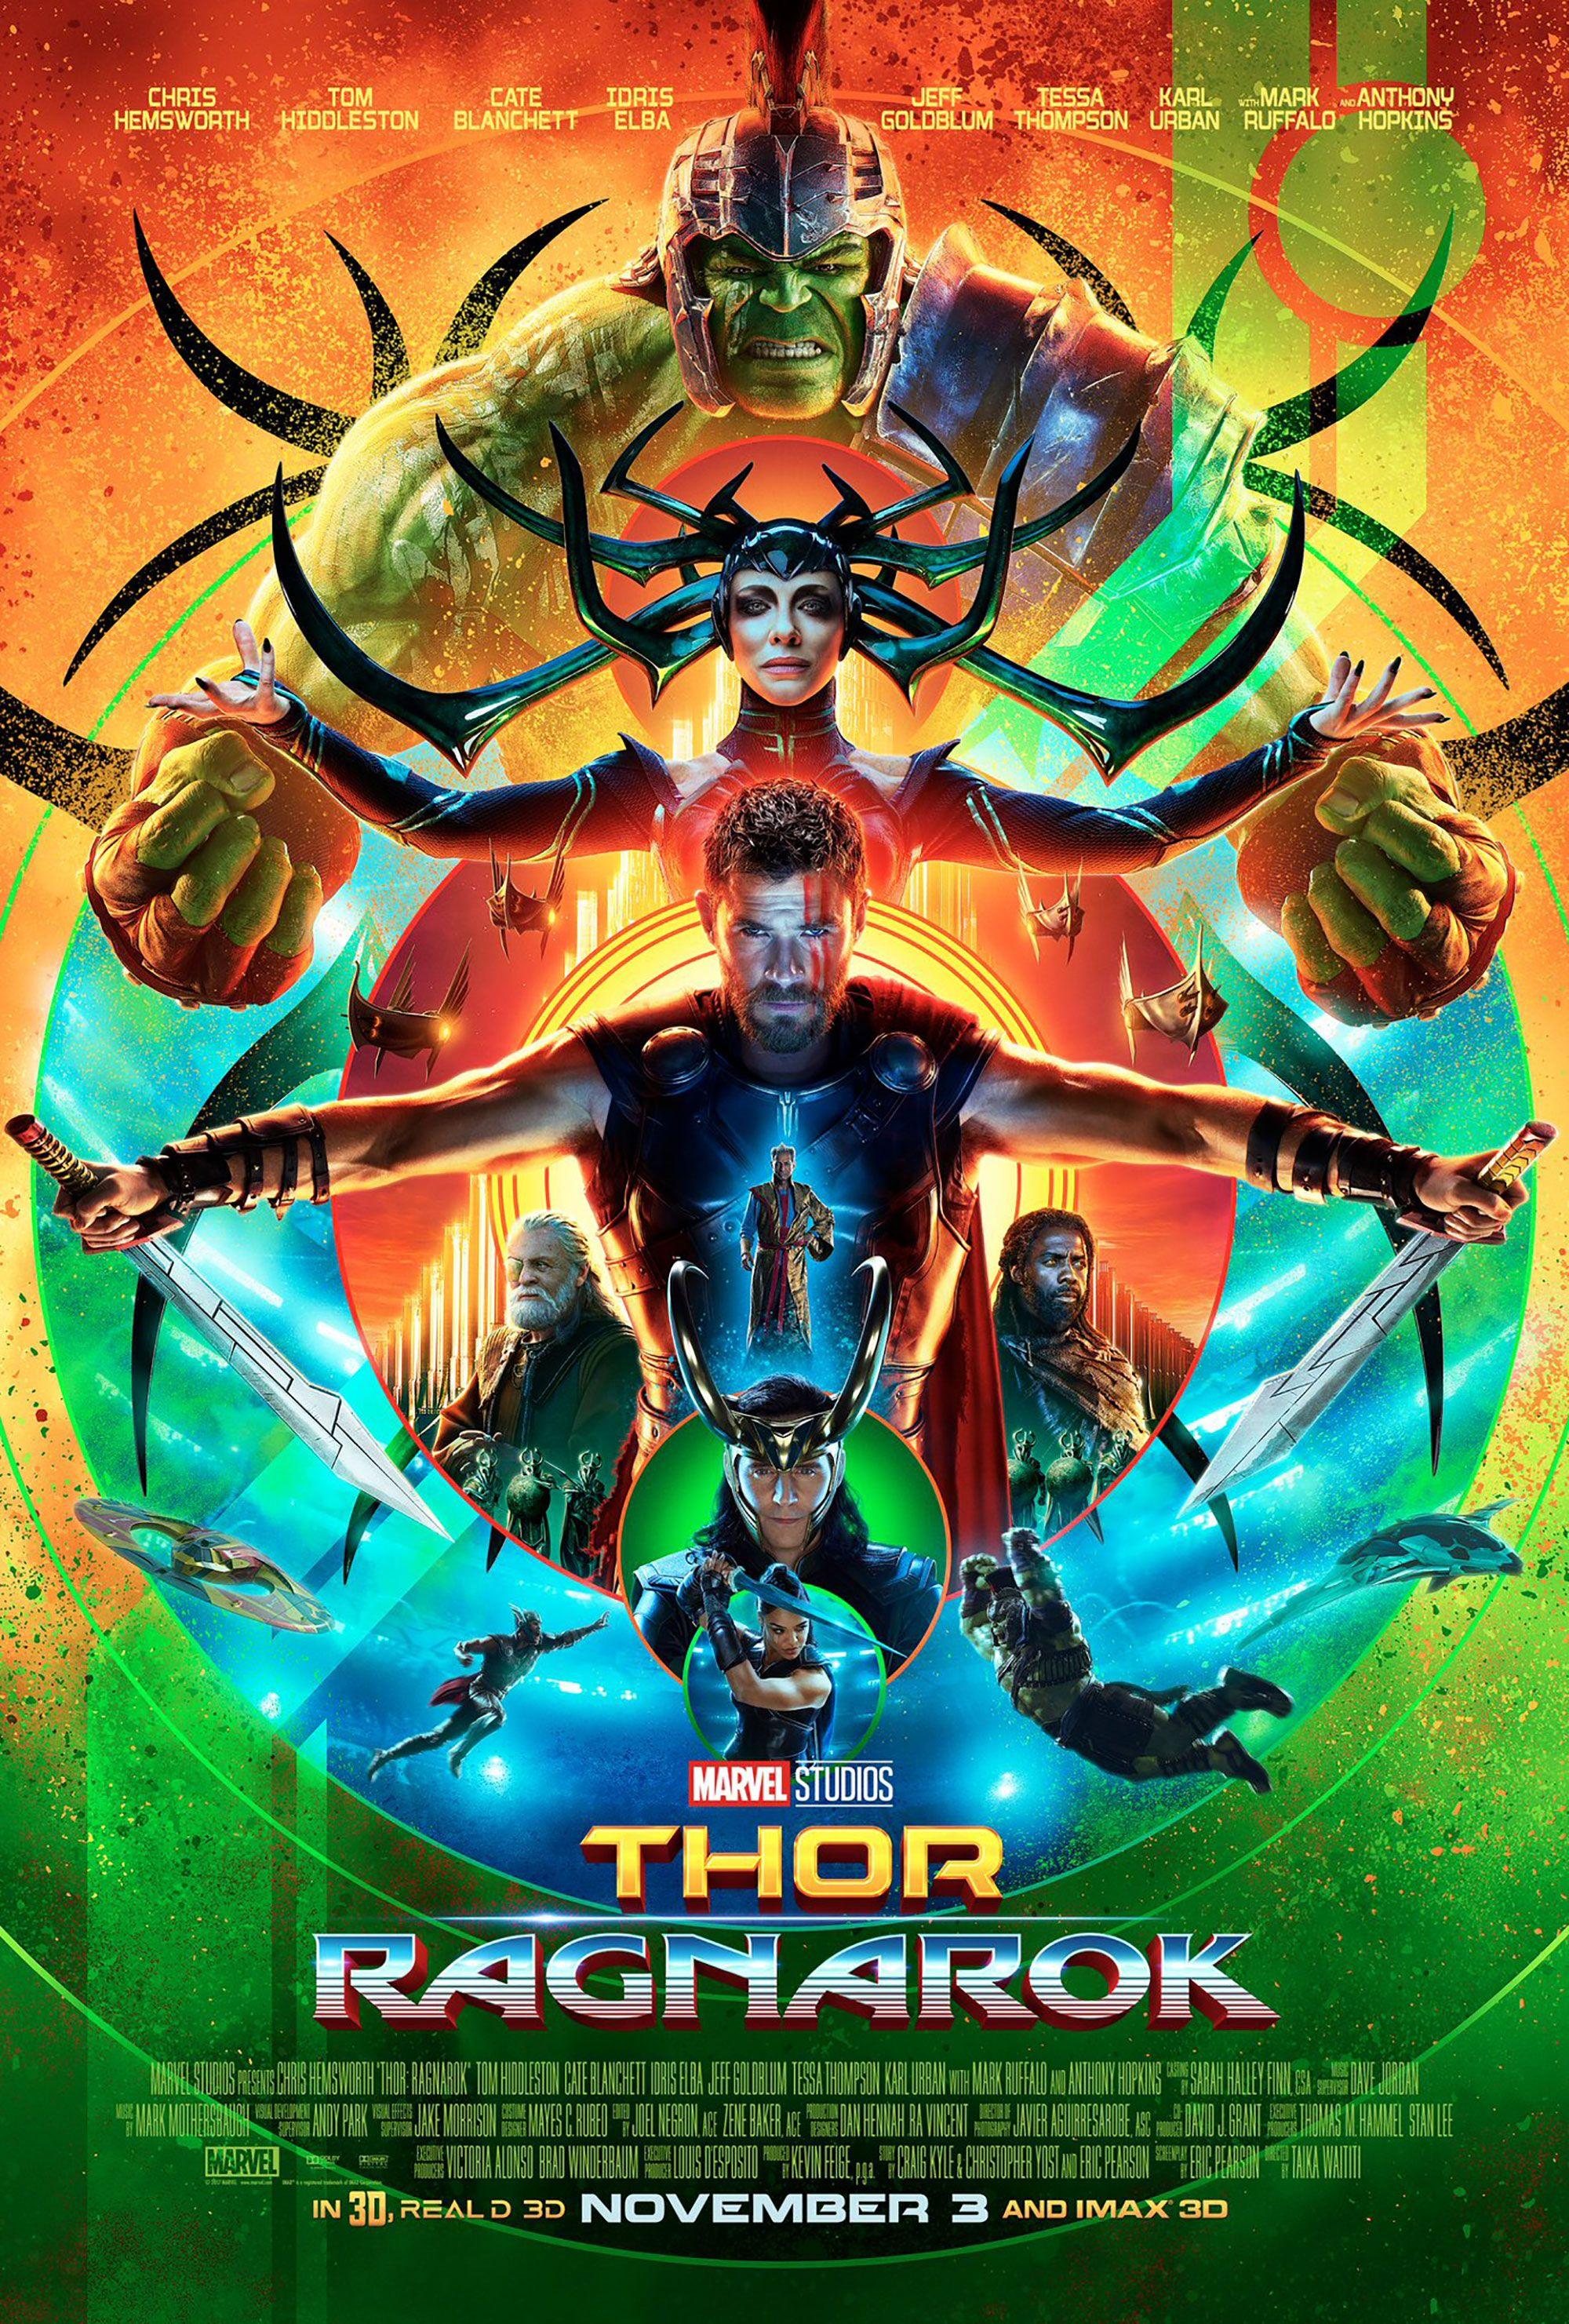 Thor Ragnarok 2017 Movie Posters マーベル映画 マーベル